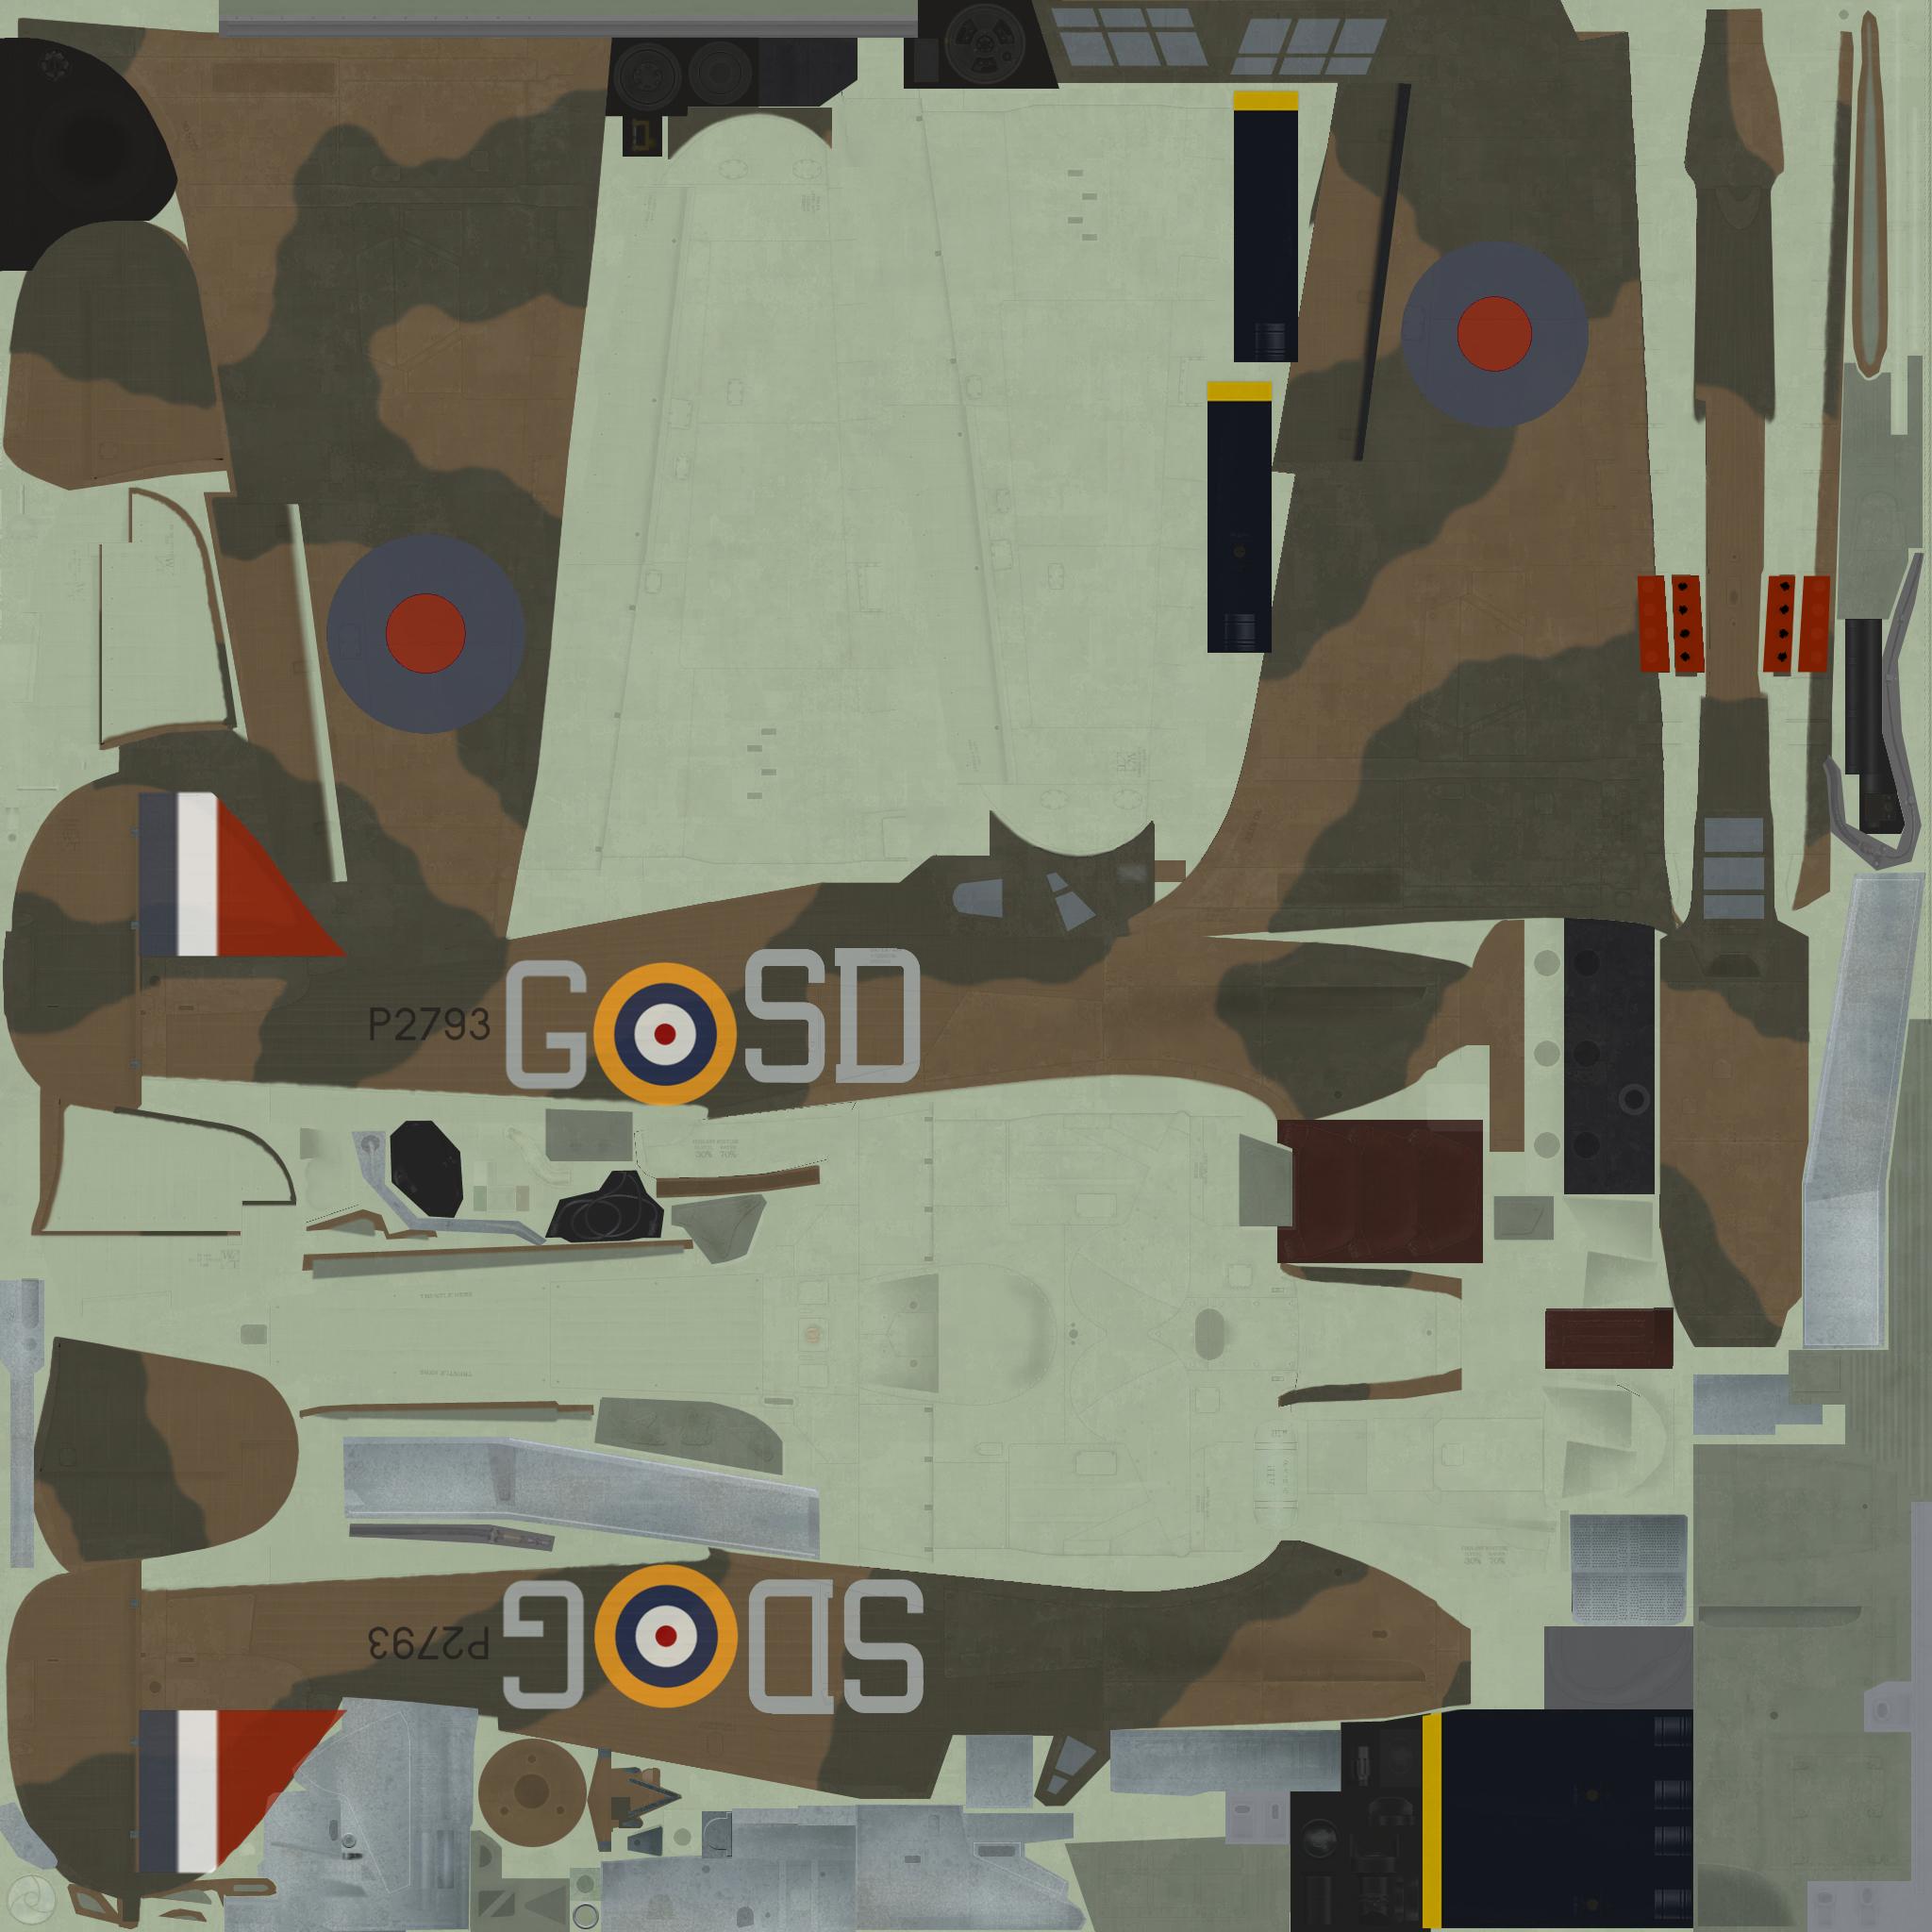 COD C6 Hurricane I RAF 501Sqn SDG Ginger Lacey P2793 England 1940